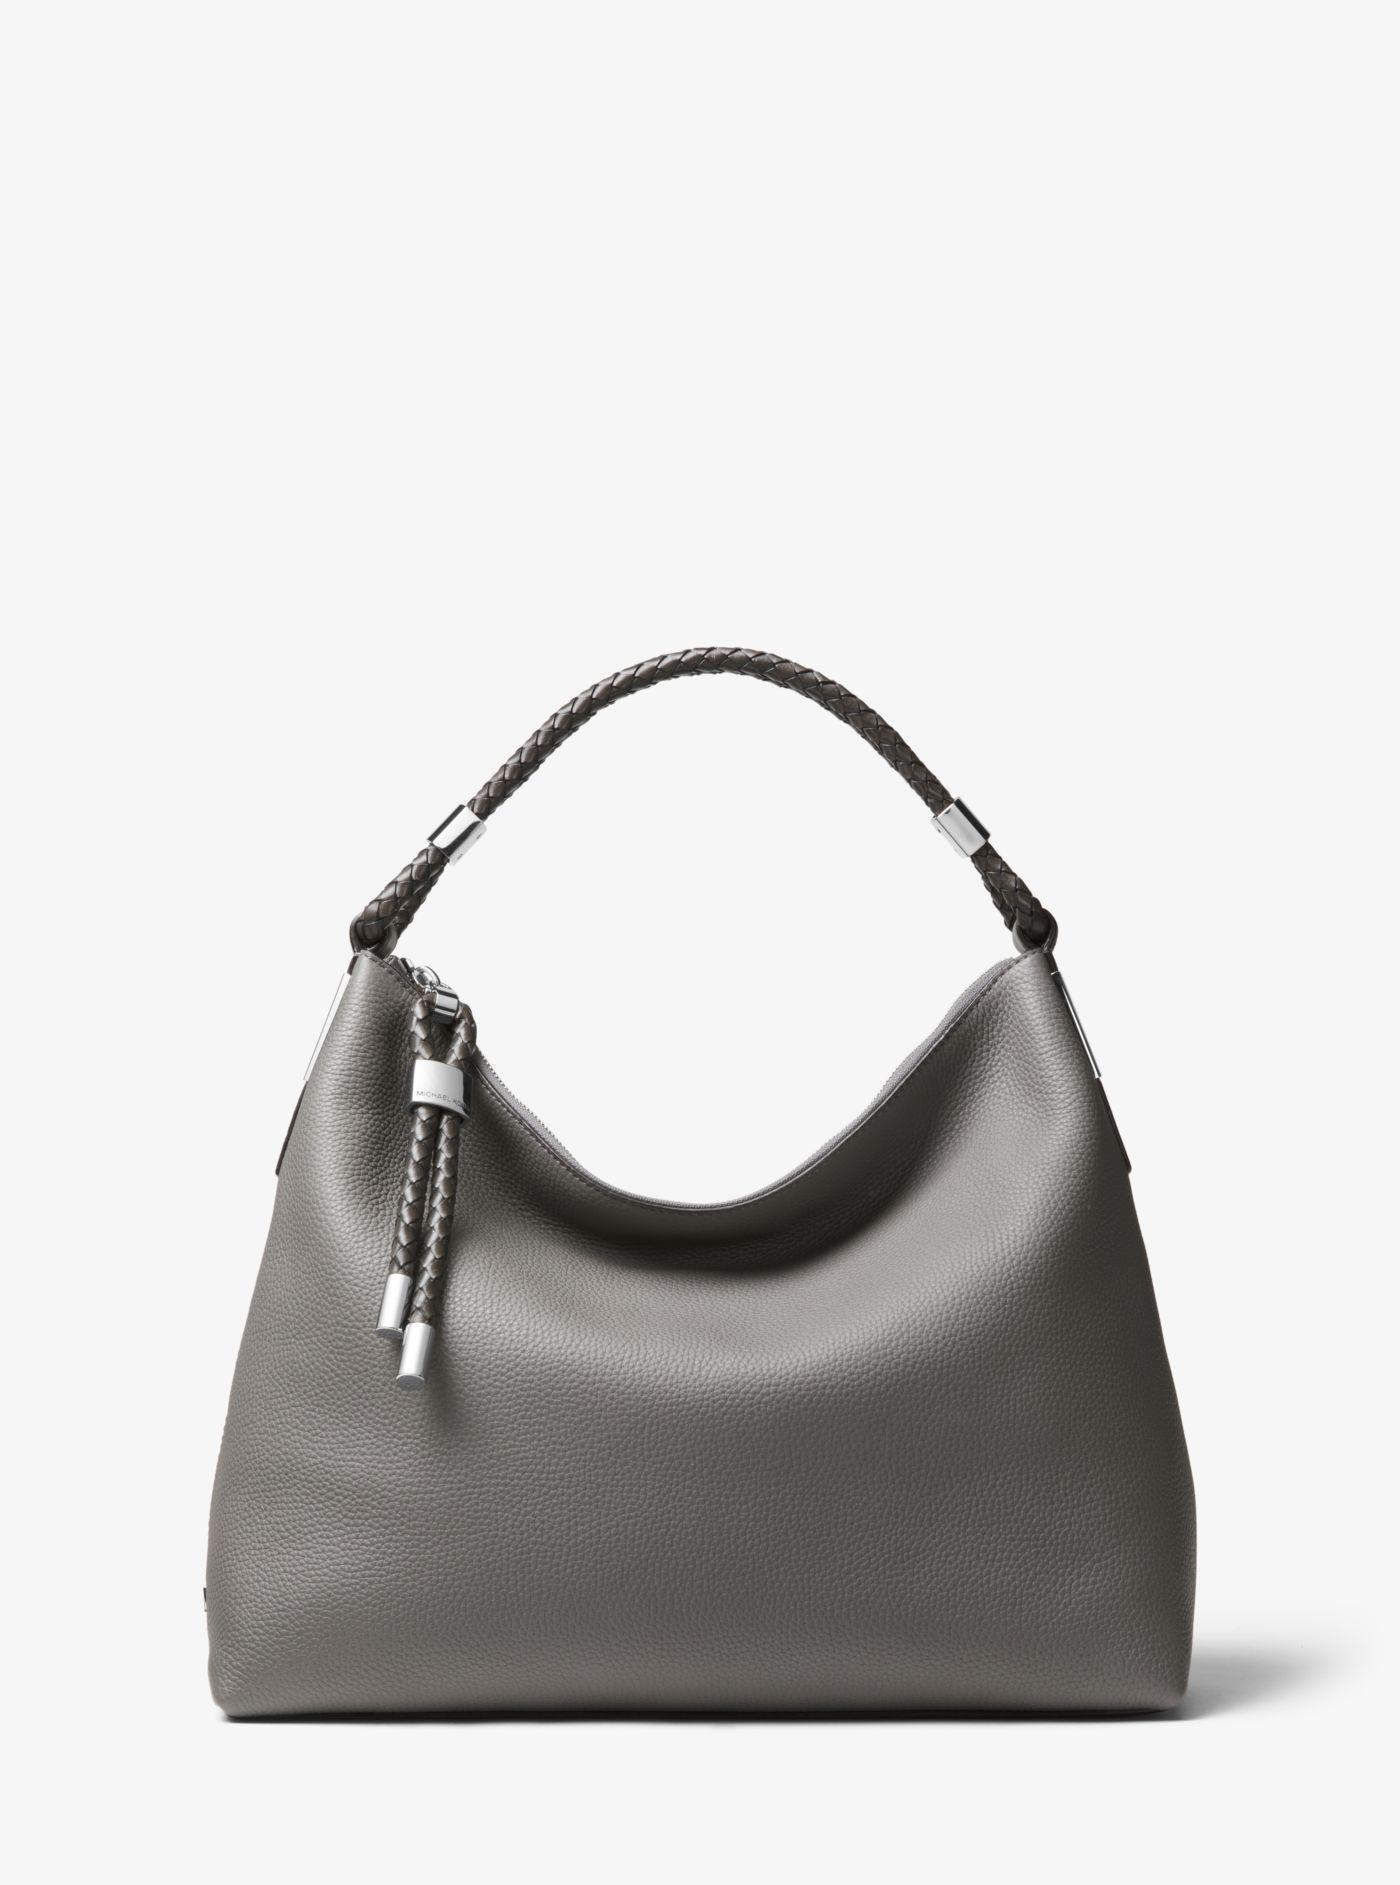 b3656212331f Michael Kors. Women s Skorpios Small Pebbled Leather Shoulder Bag